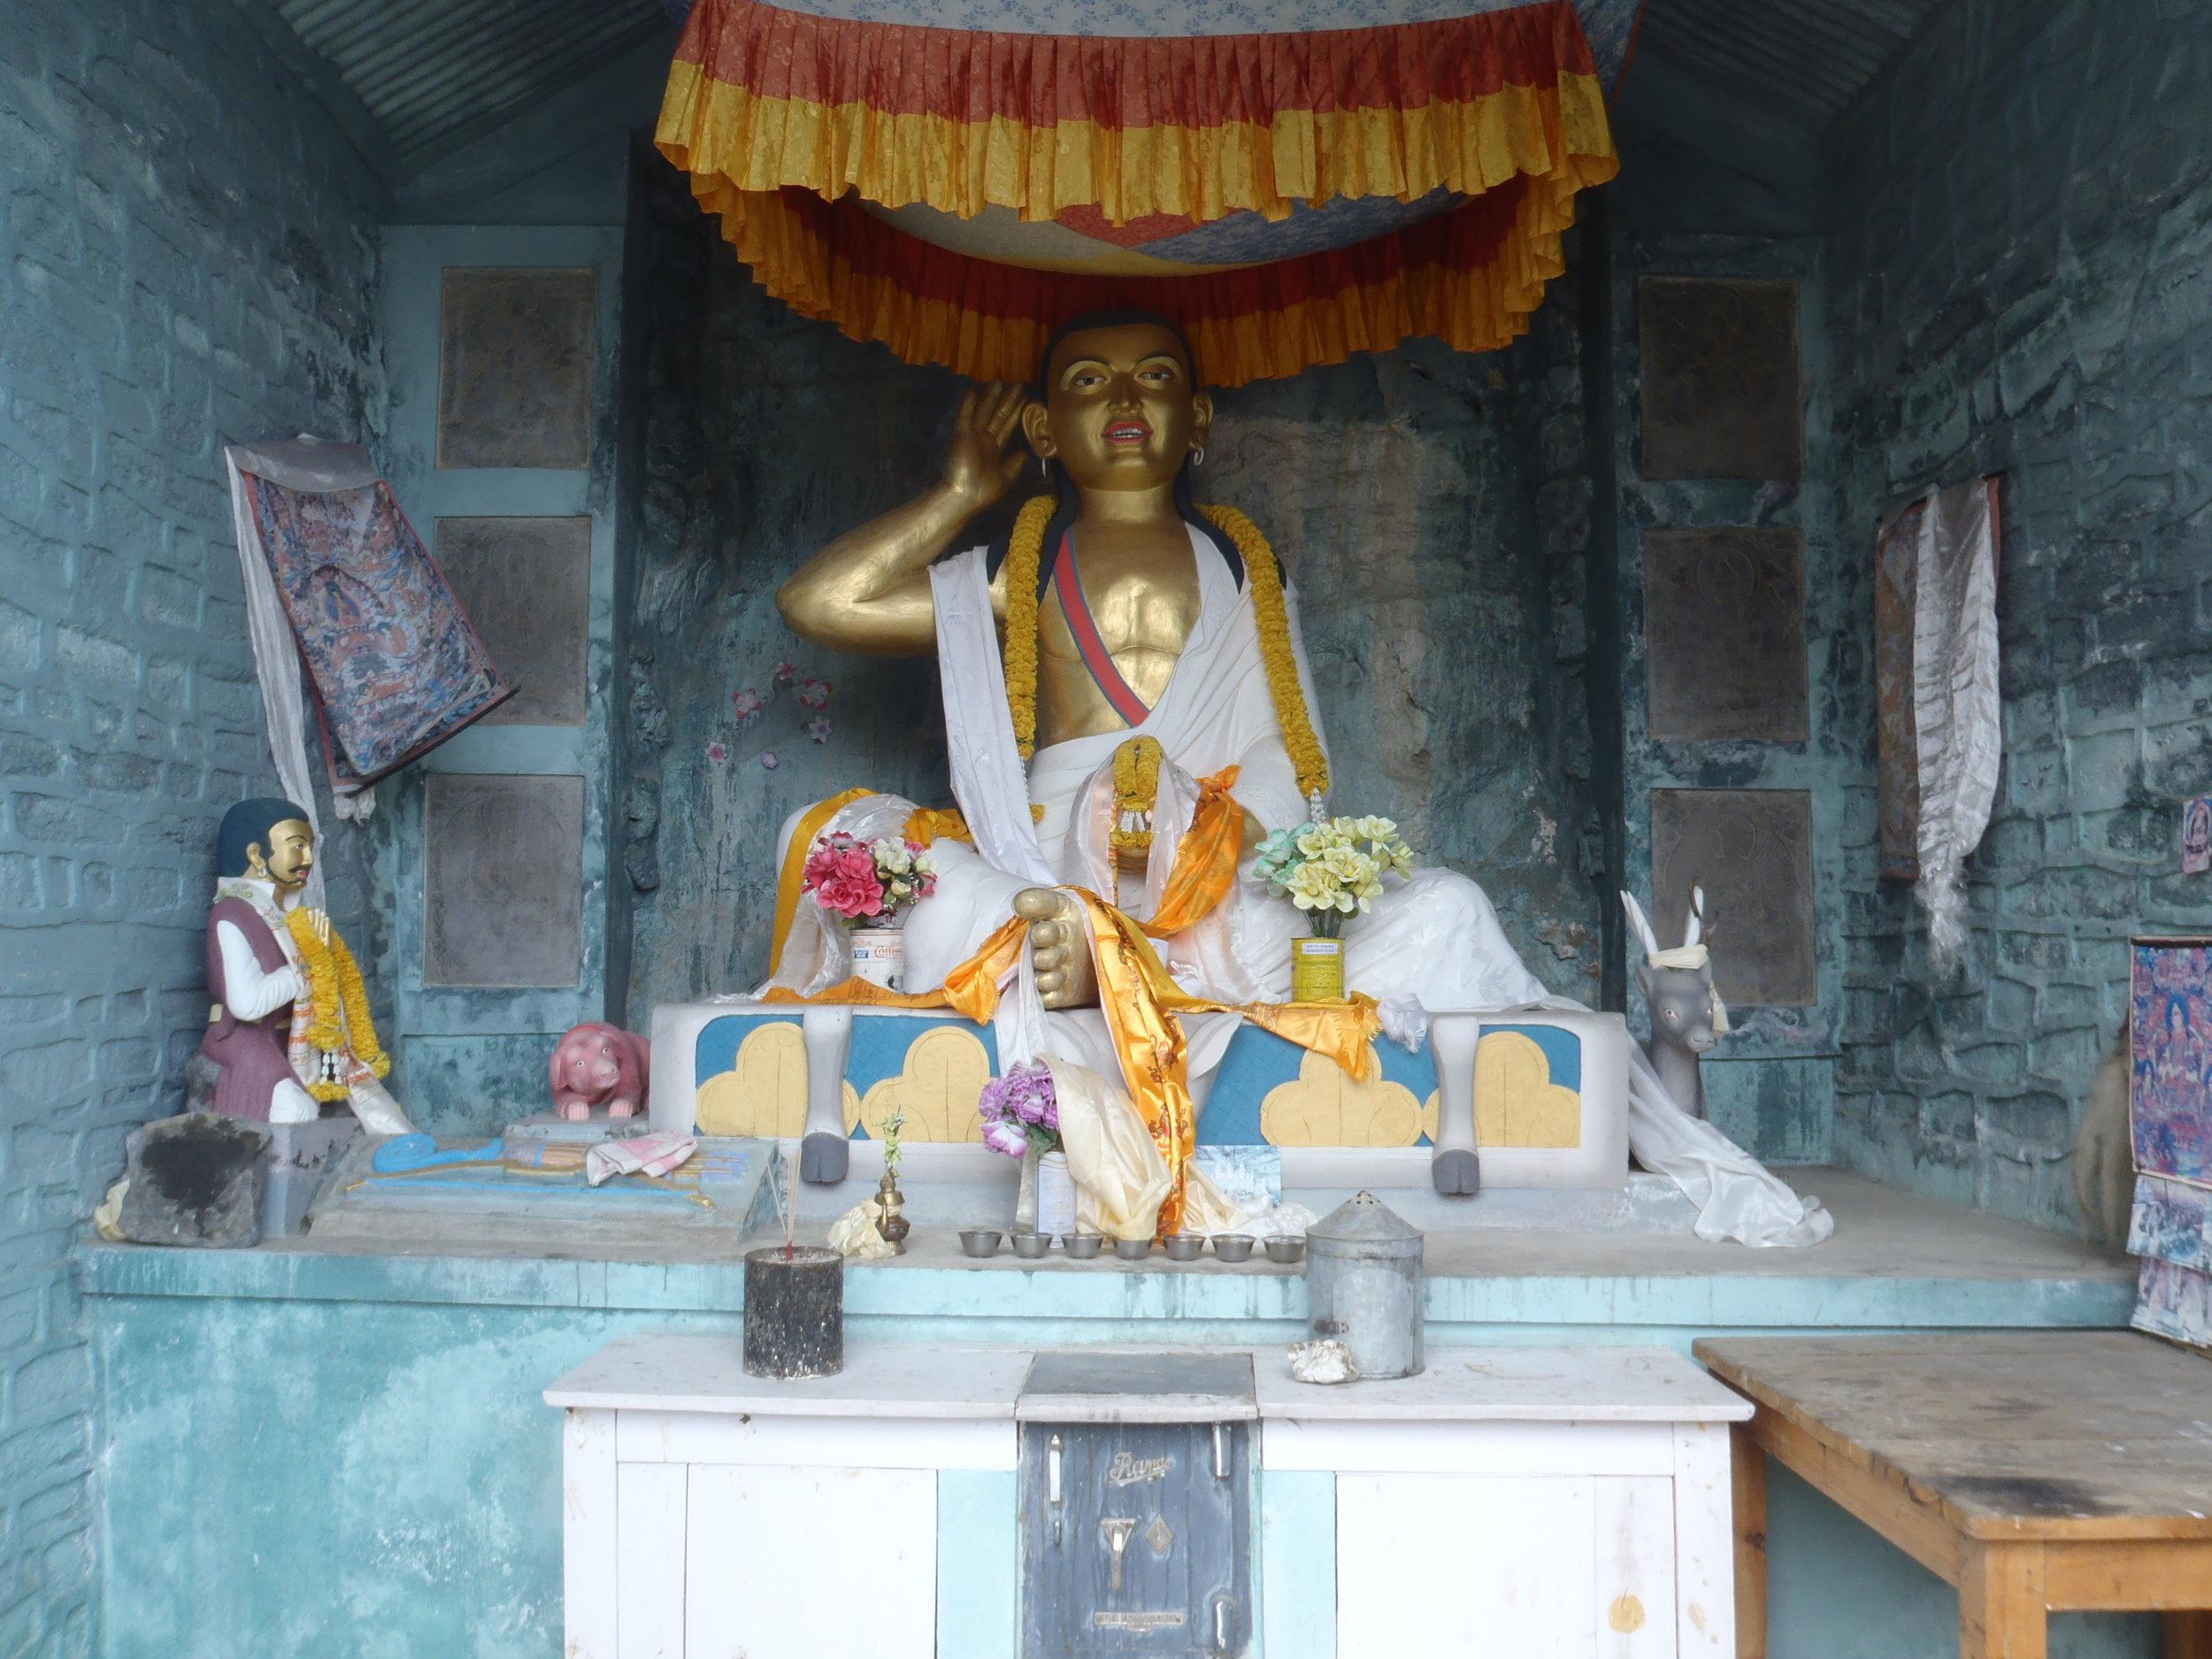 A shrine to Milarepa